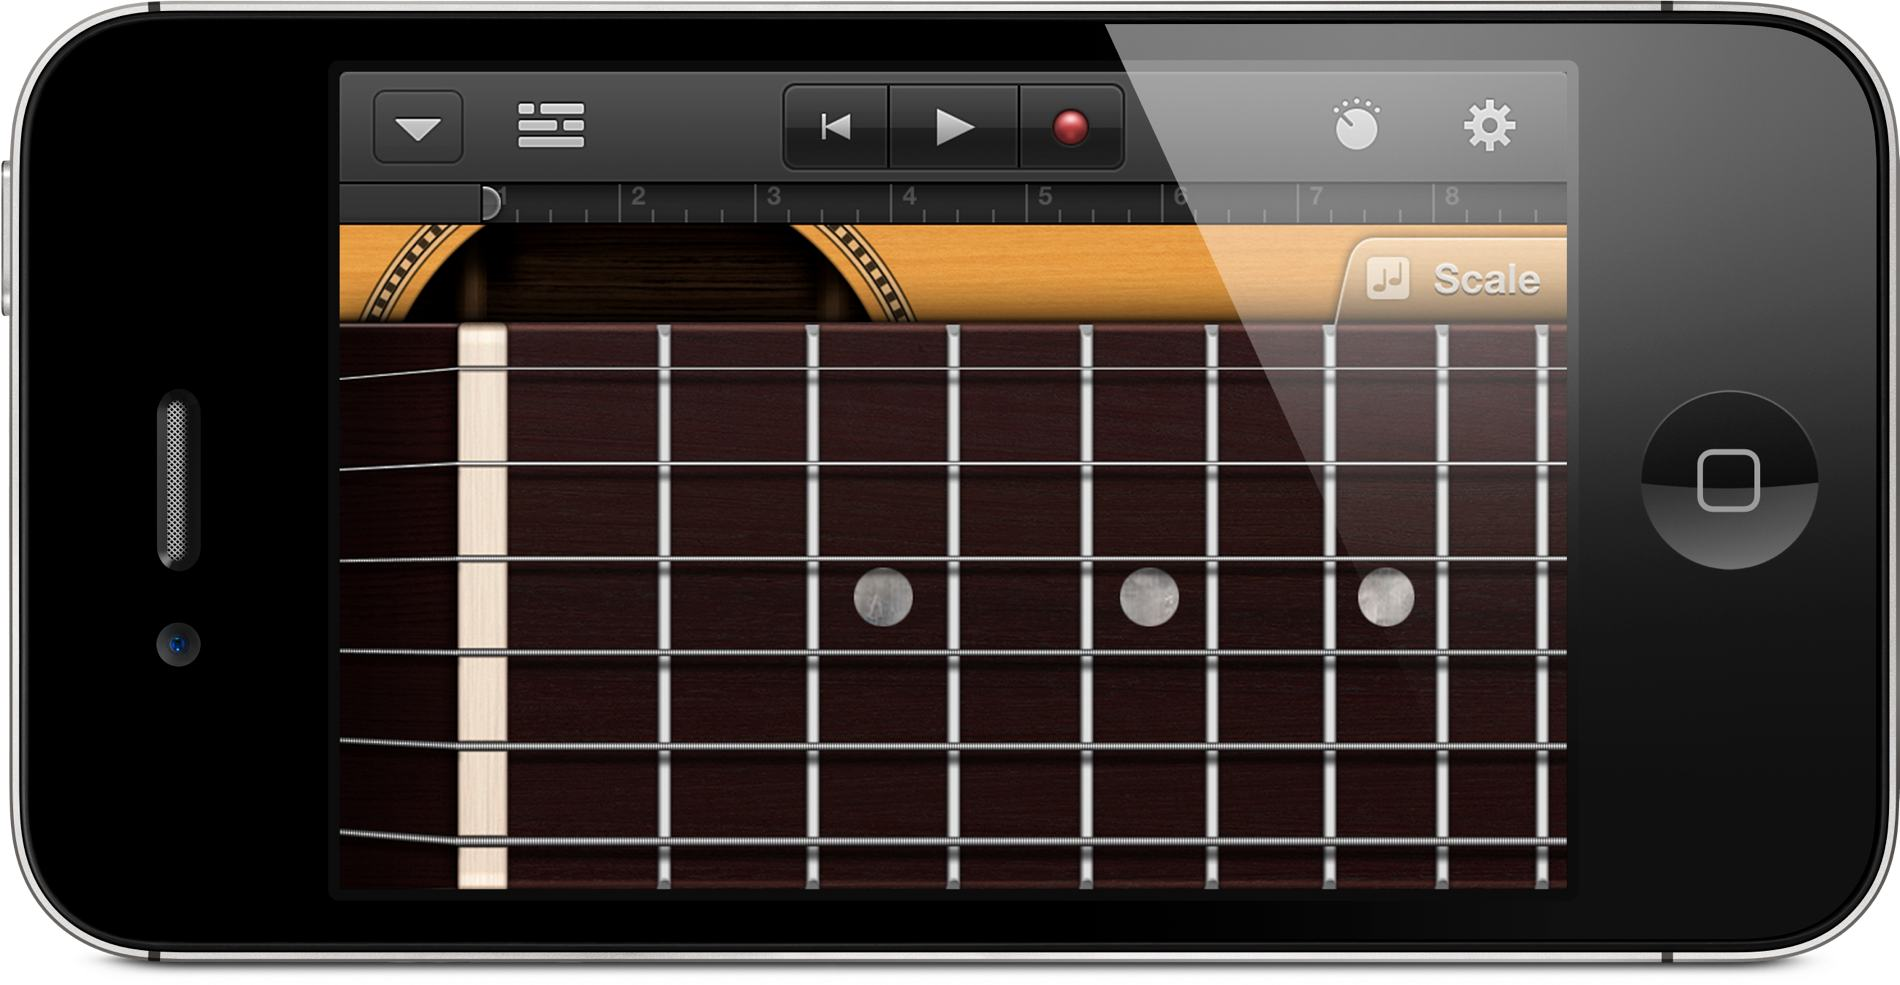 handheld garageband apple 39 s mobile music maker on iphone ipod touch cdm create digital music. Black Bedroom Furniture Sets. Home Design Ideas